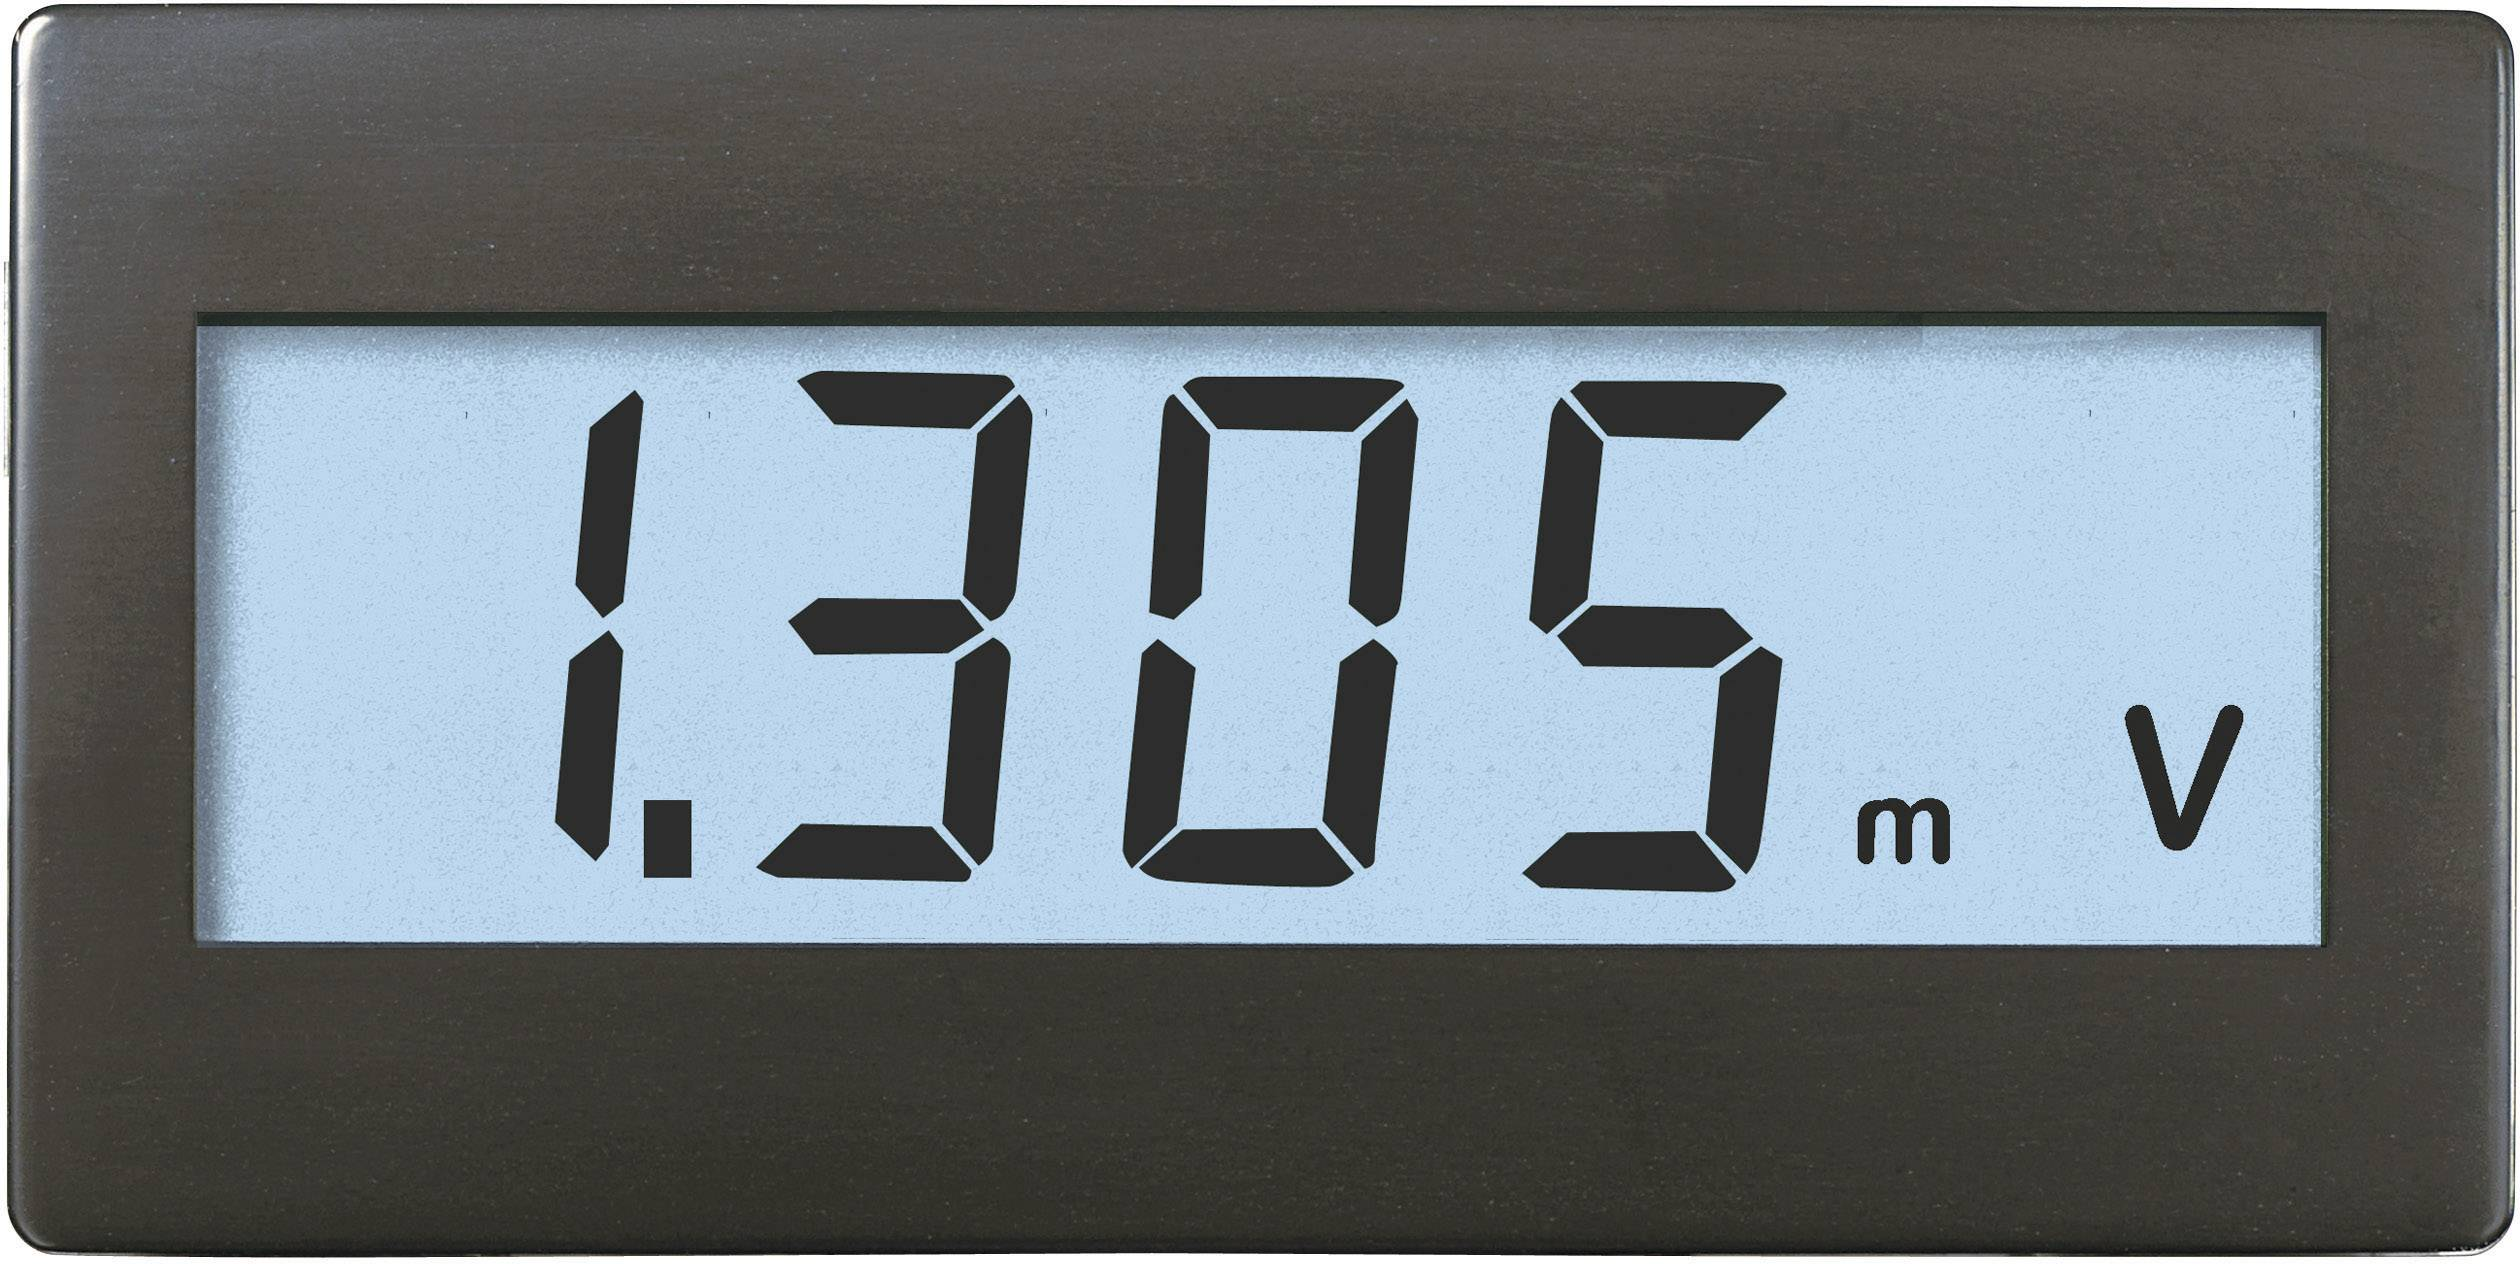 Digitálne panelové meradlo Voltcraft DVM-330W, 68 x 33 mm